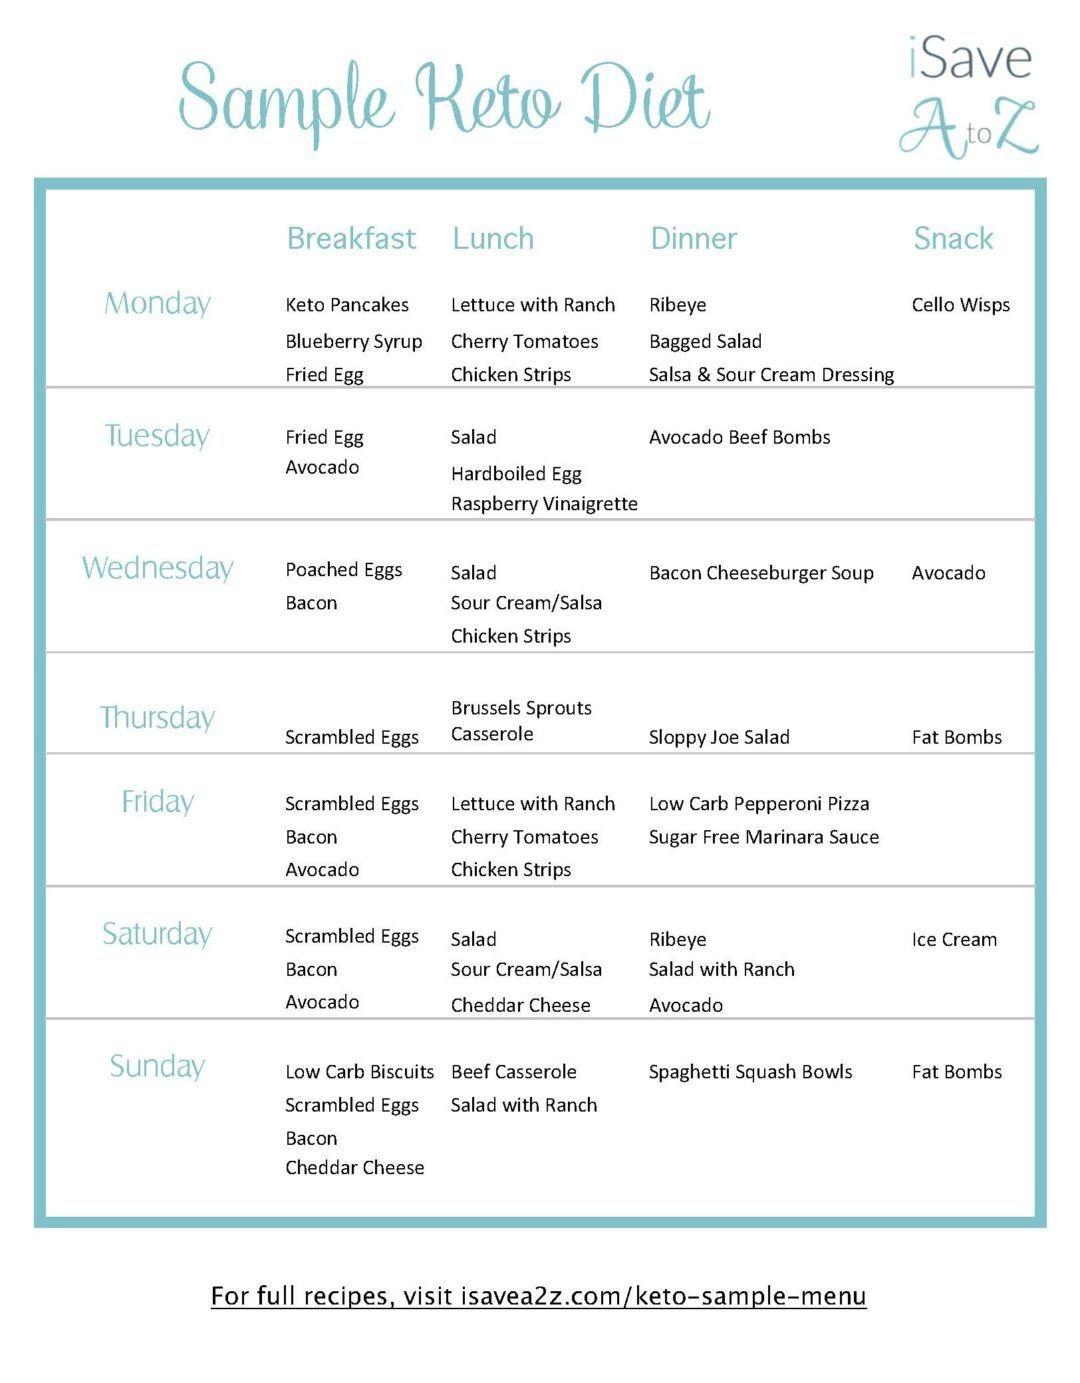 Grab This Printable 7 Day Keto Sample Menu Plan   Keto   Keto, Keto - Free Printable Low Carb Diet Plans